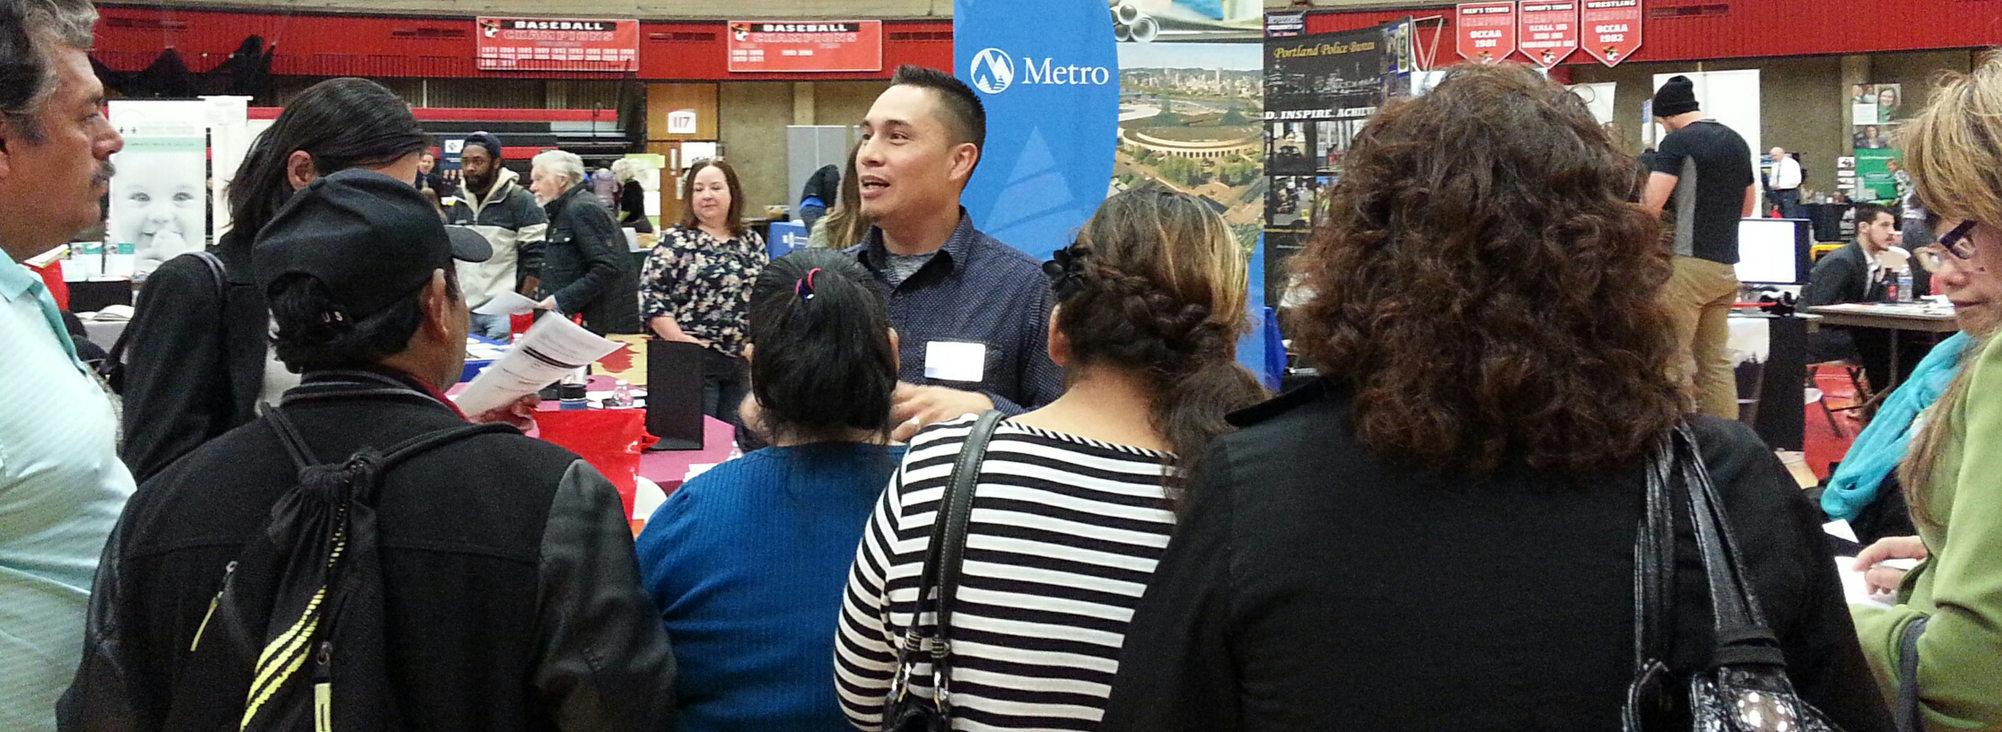 Job fair at Mt. Hood Community College